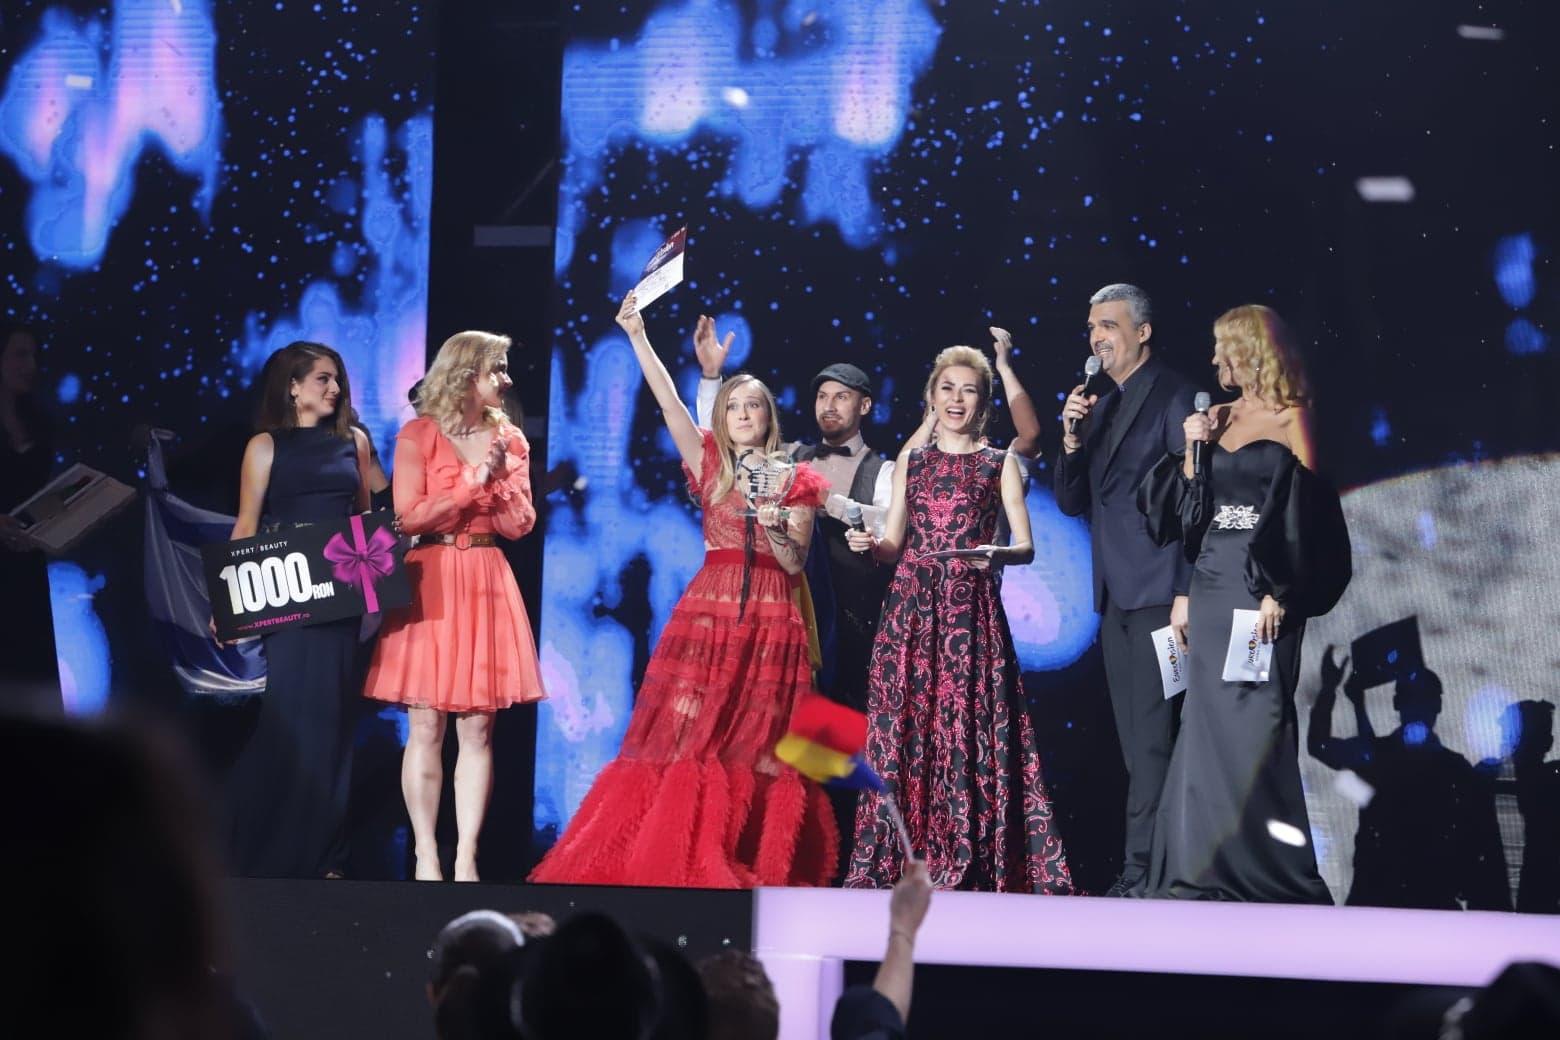 ester peony eurovision